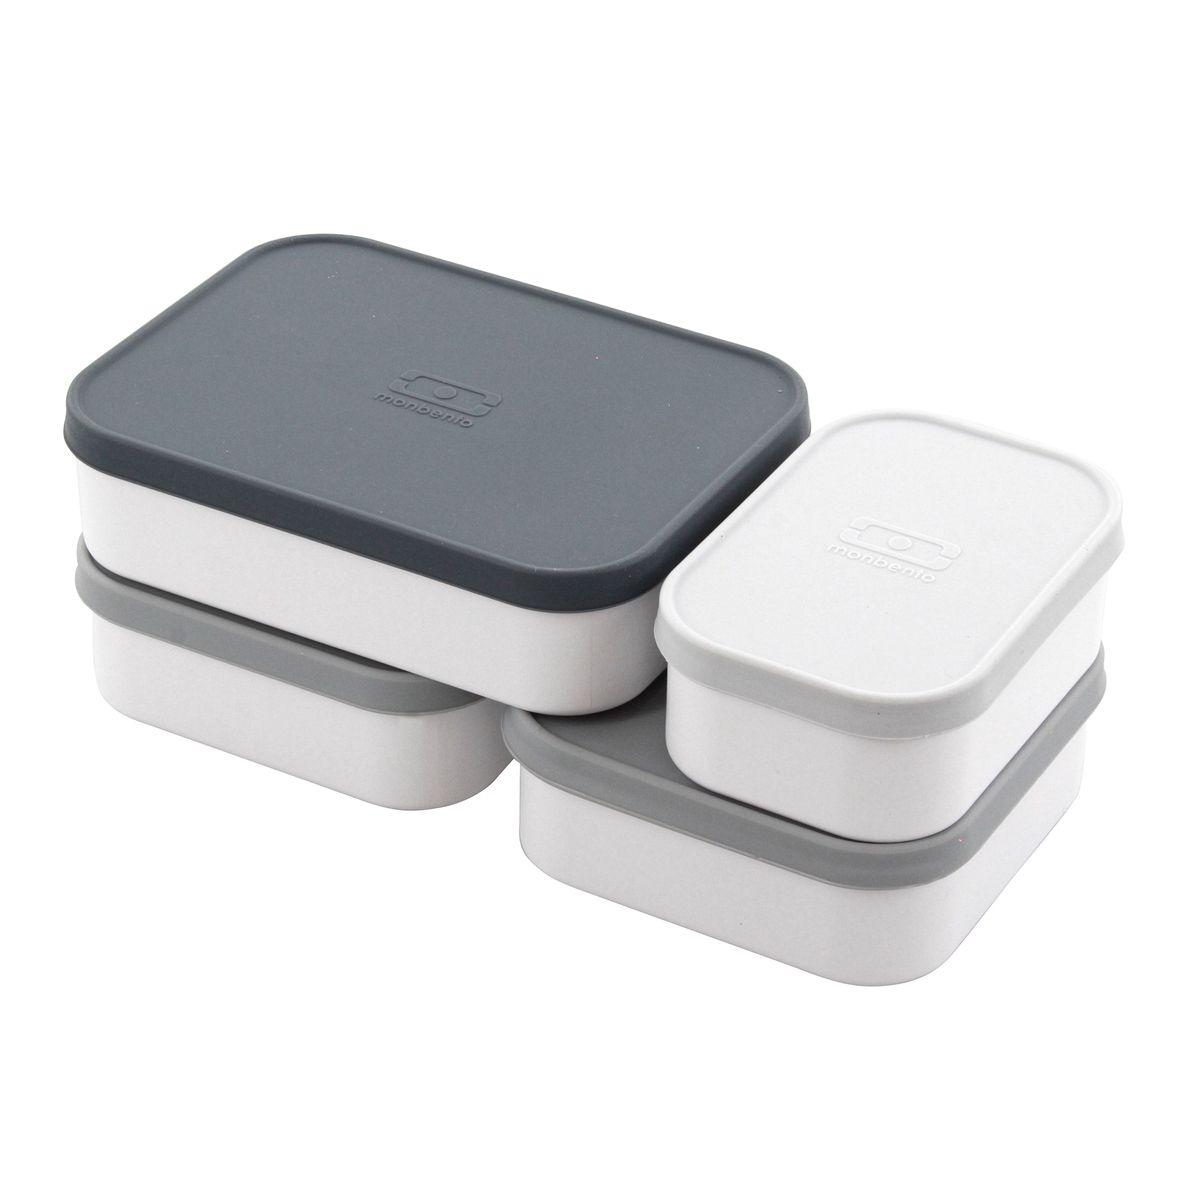 Set de 4 boites de compartimentation pour bento MB Original - S+L+ 2xM - Monbento